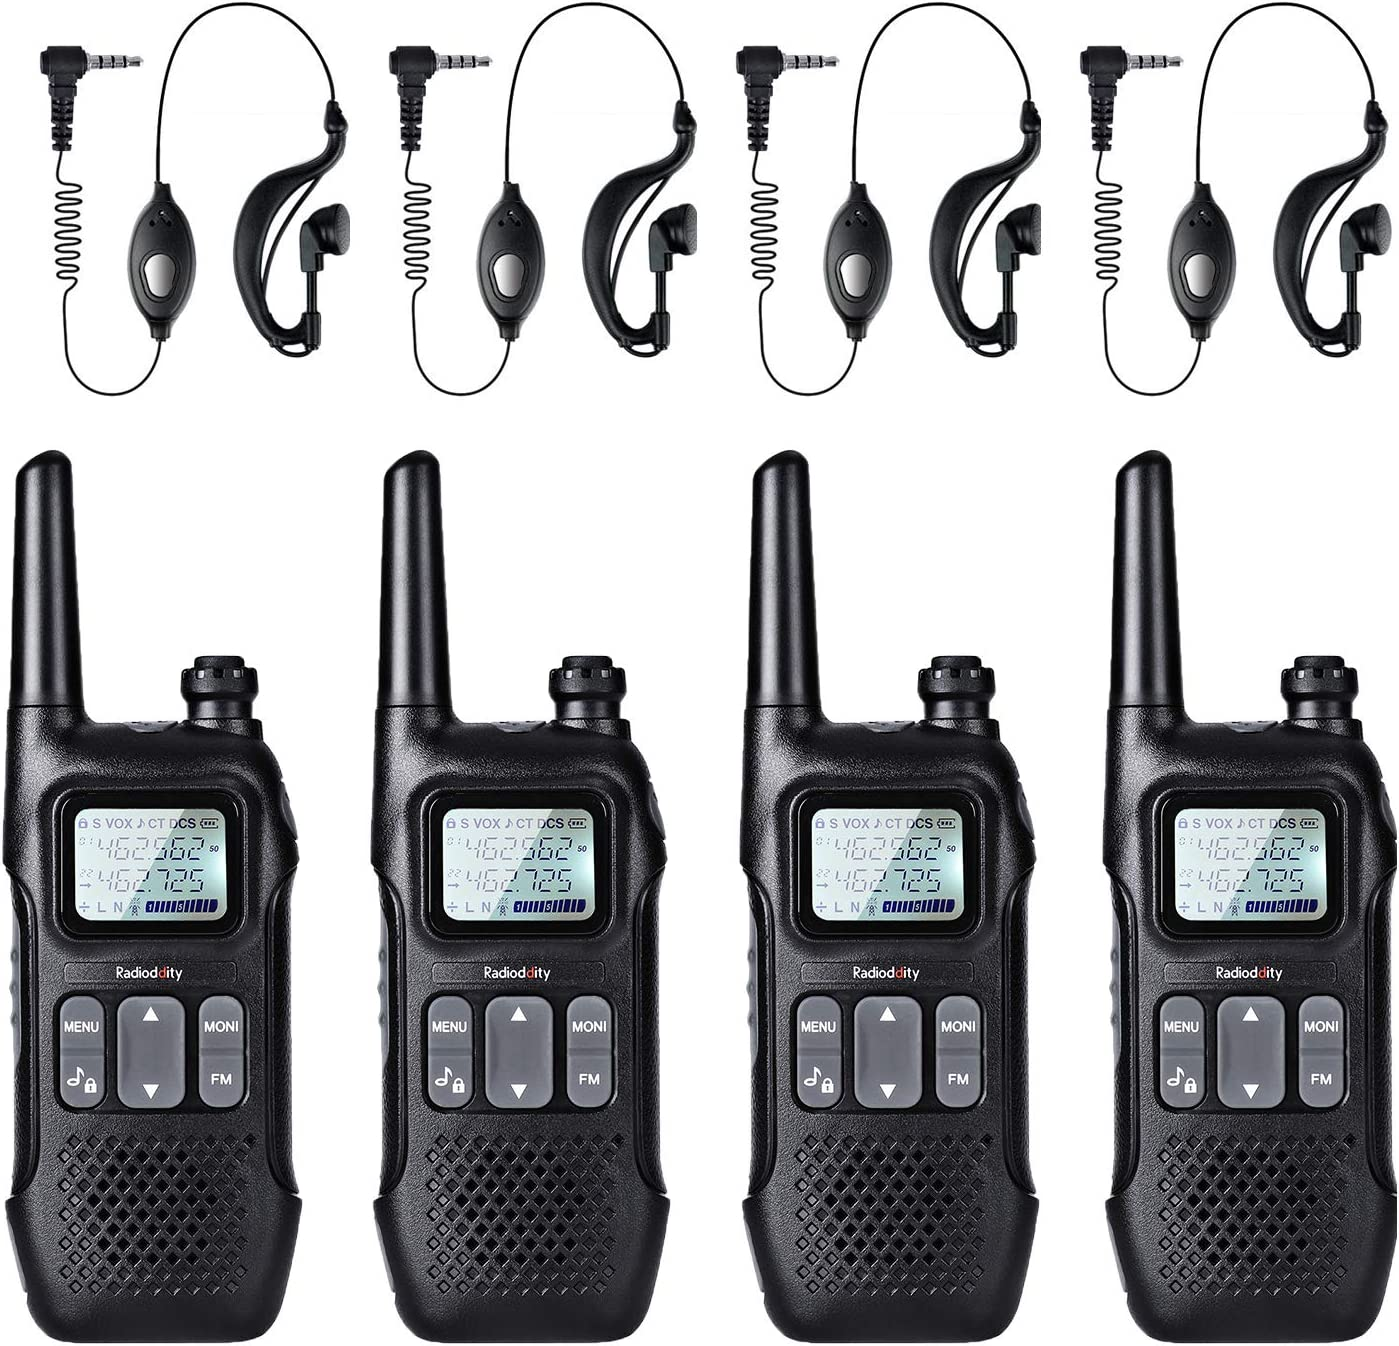 Radioddity FS-T1 FRS NOAA Two-Way Radio, Kids Walkie Talkies, 22 CH with FM, Earpiece, Flashlight, USB Charging, 4 Pack